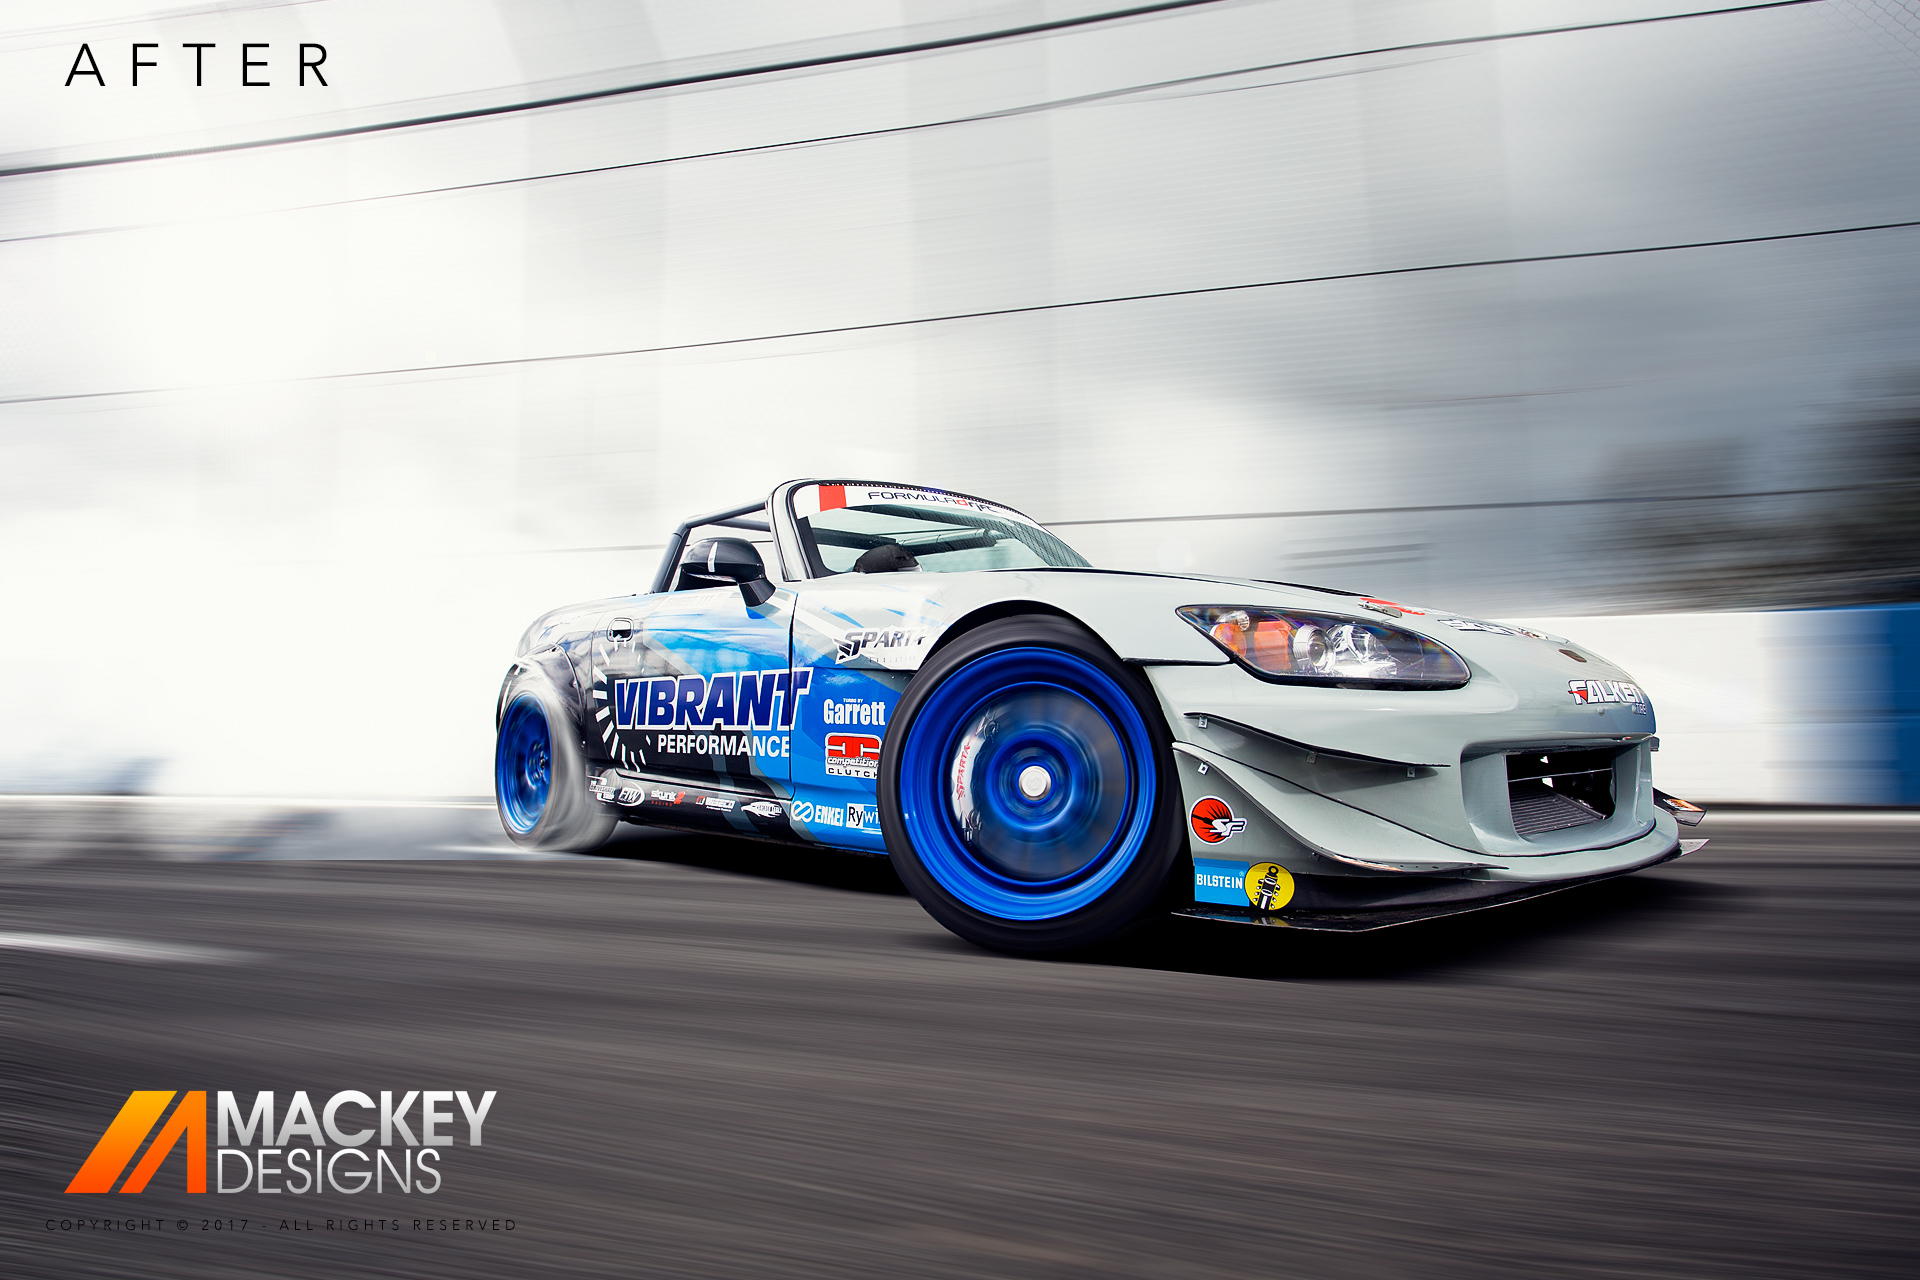 Automotive Photographer - Seattle - Josh Mackey - Formula DRIFT S2000 After